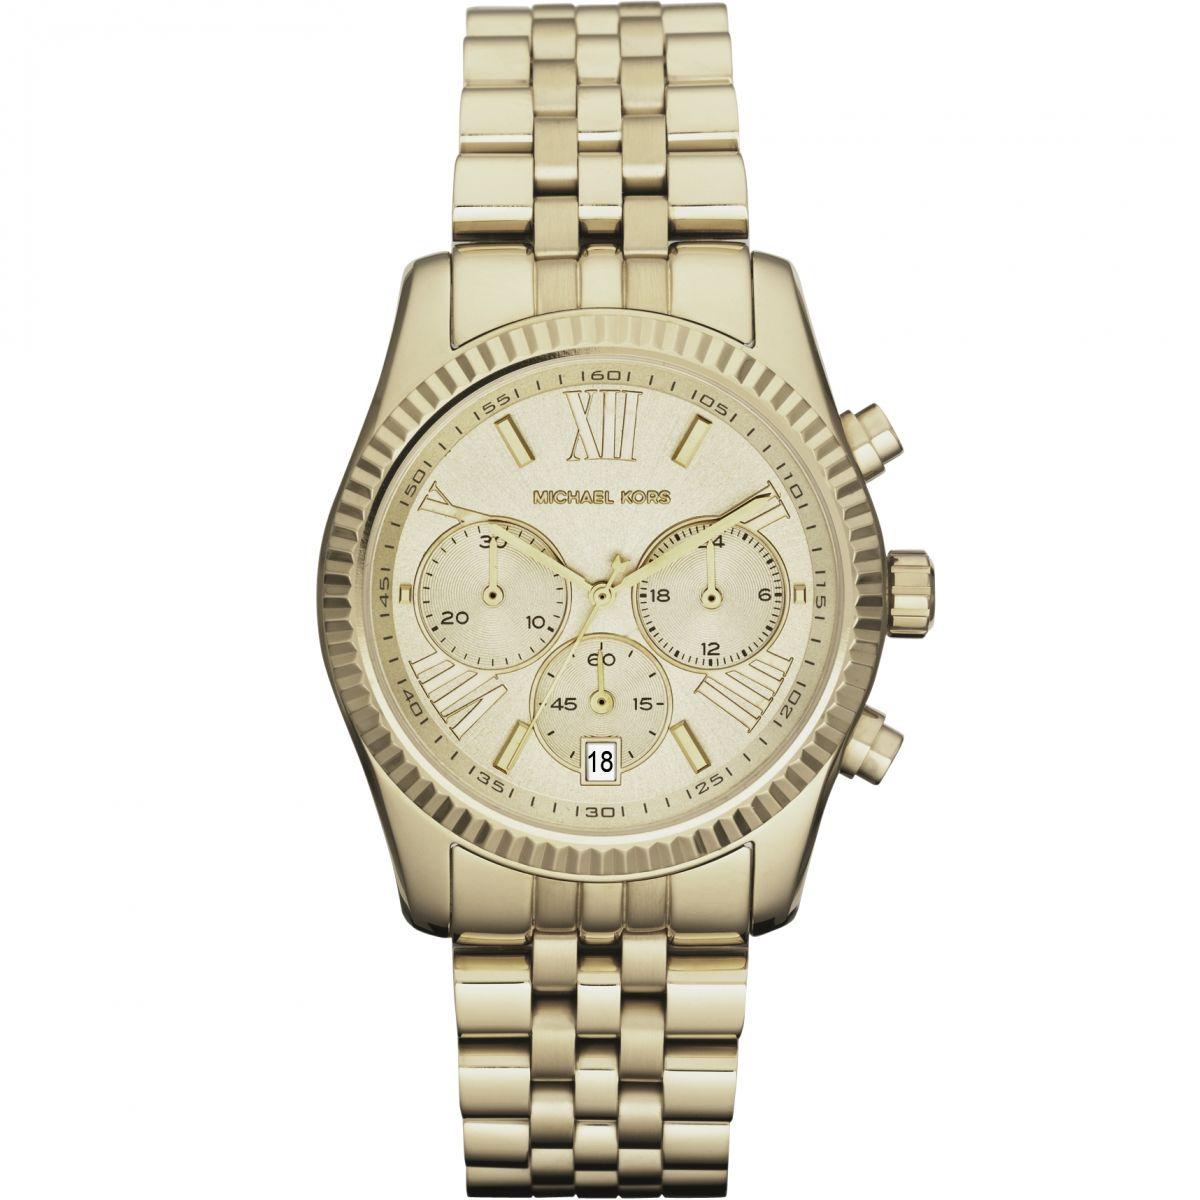 1e5c099b0574 Details about Michael Kors Lexington Chronograph Champagne Dial Gold PVD  Ladies Watch MK5556